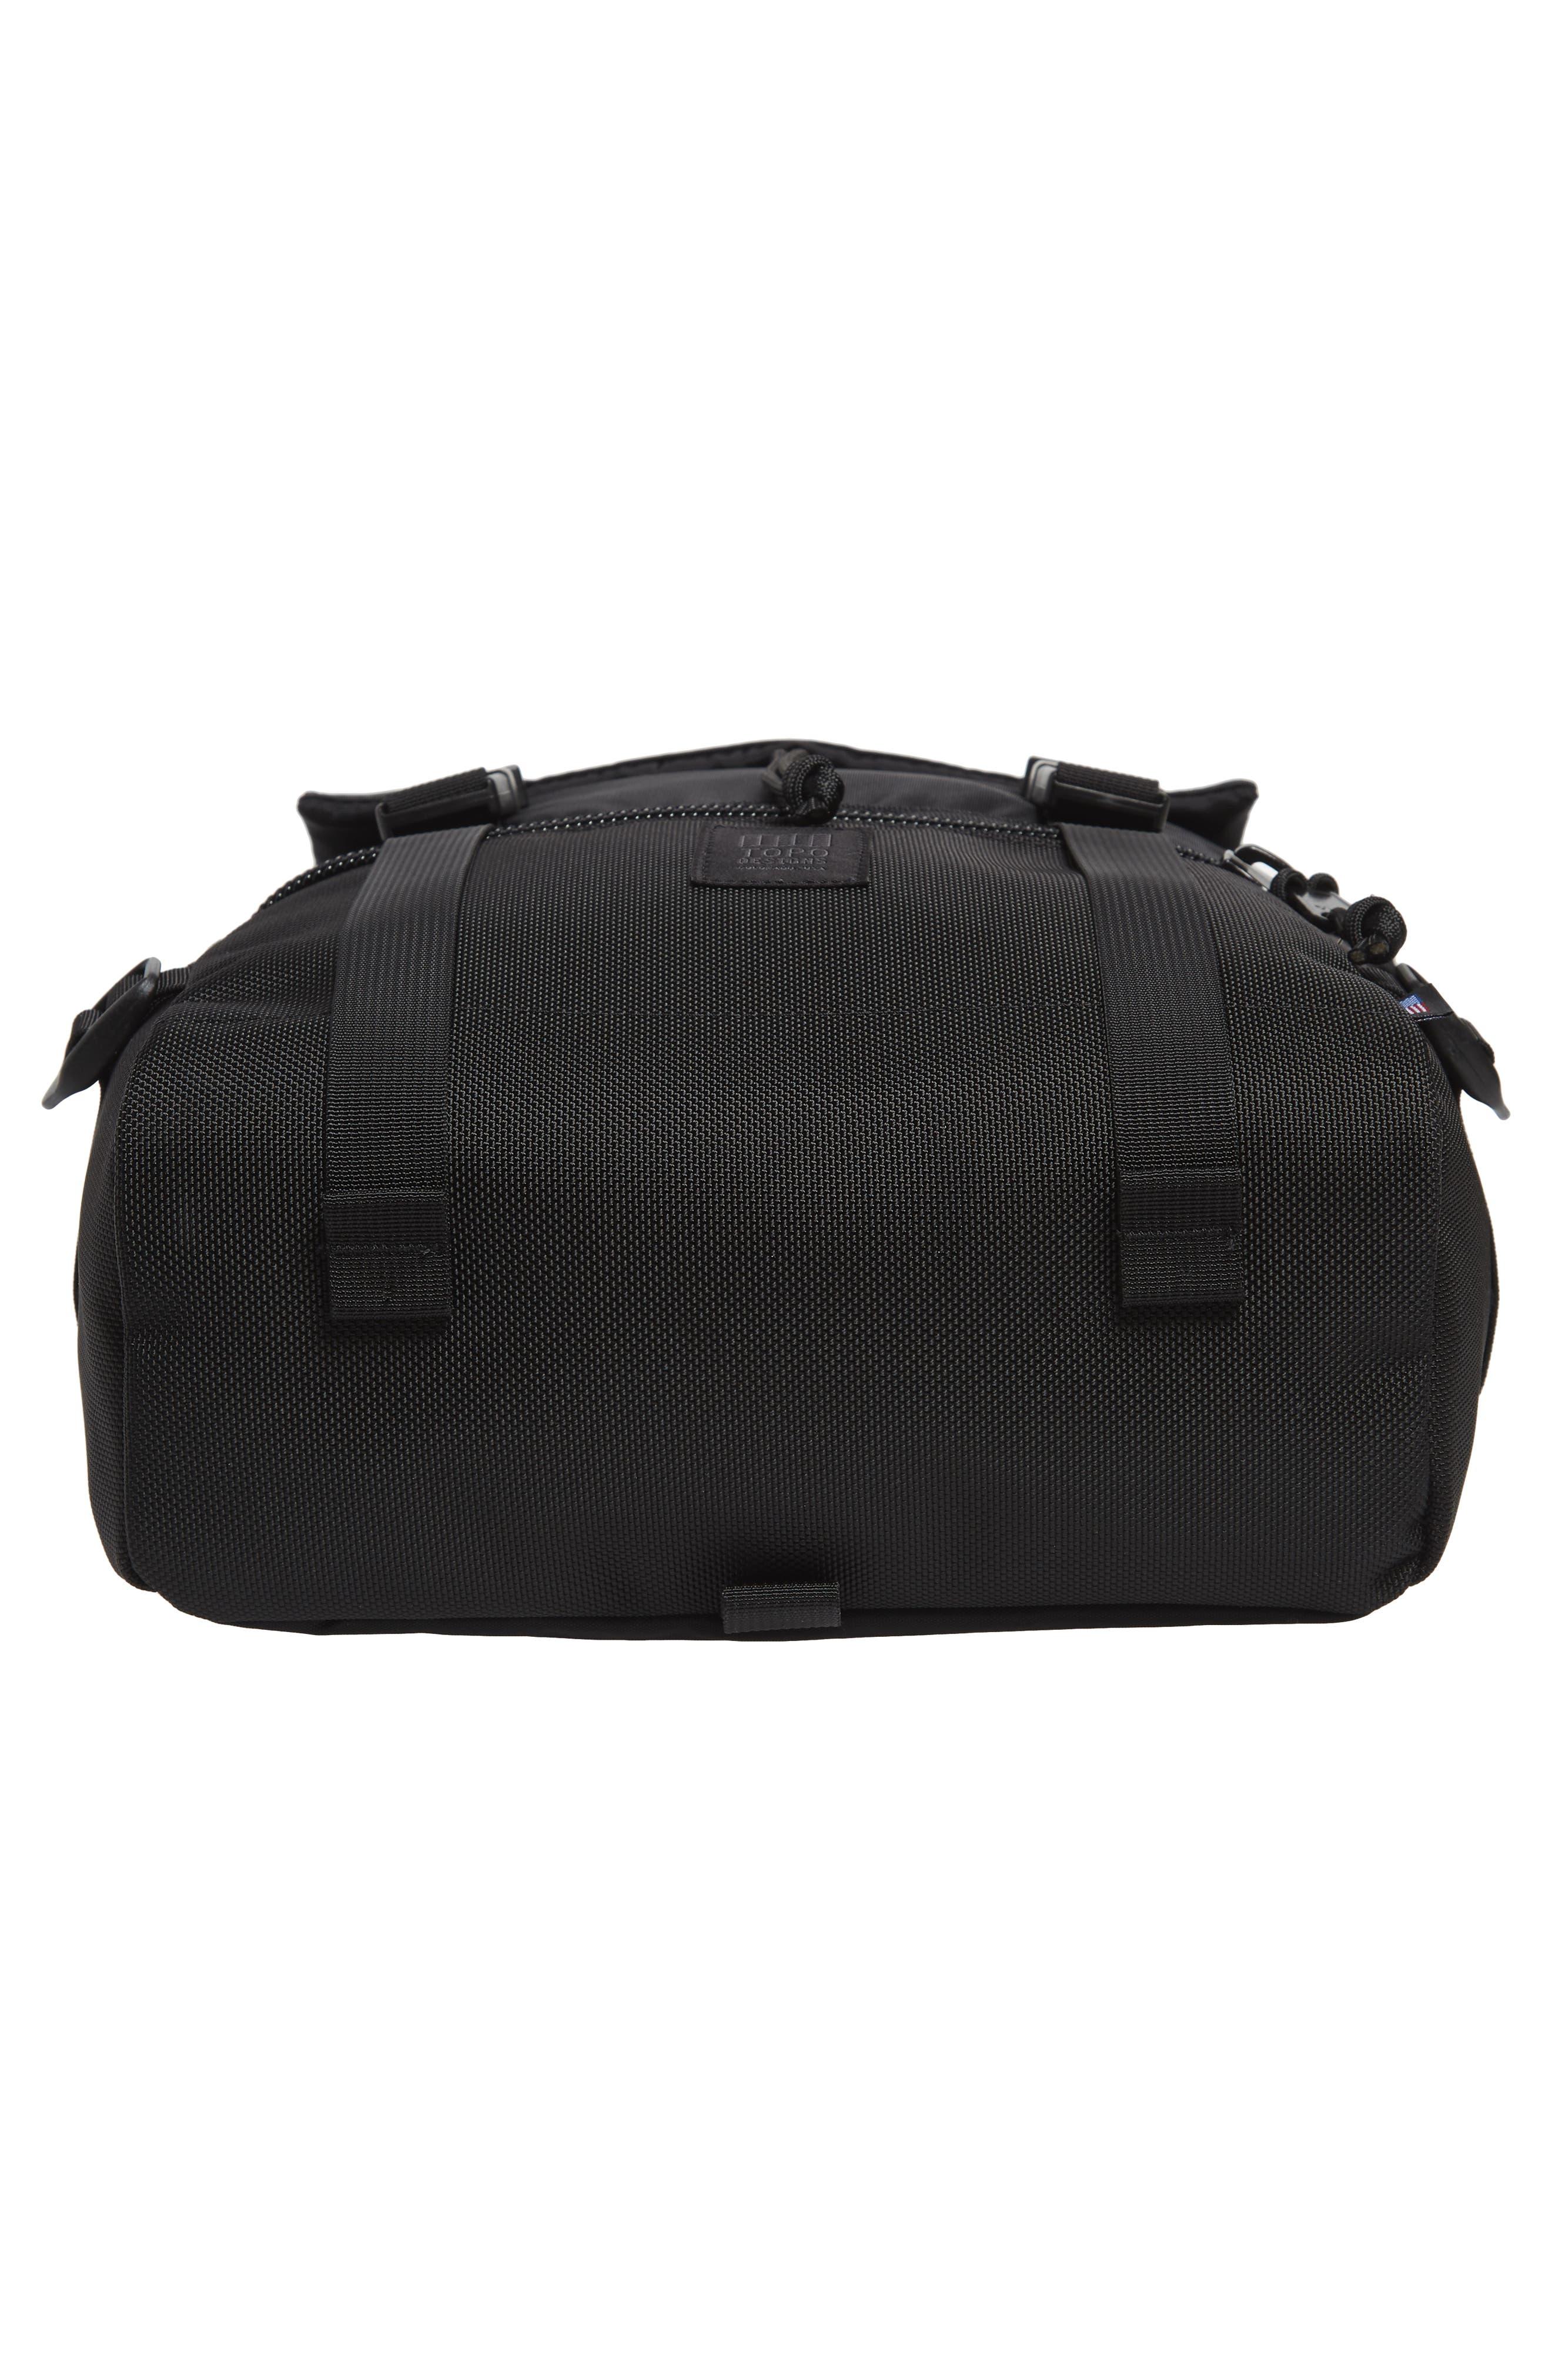 'Rover' Backpack,                             Alternate thumbnail 4, color,                             BALLISTIC BLACK